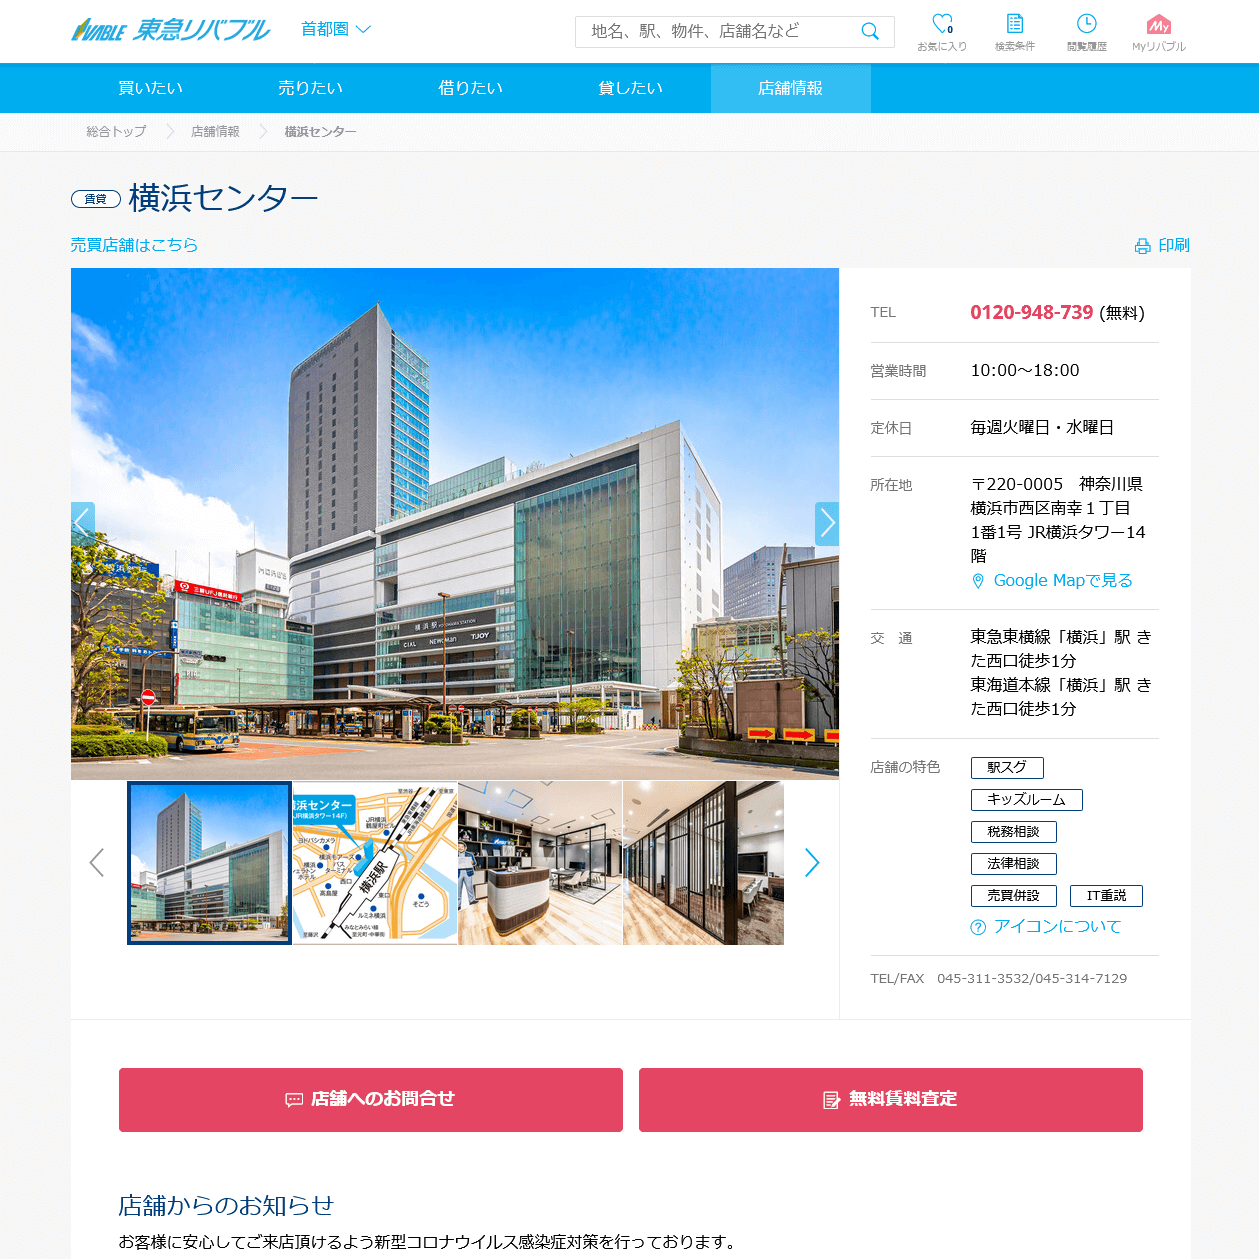 "<span class=""title"">東急リバブル 横浜センター</span>"